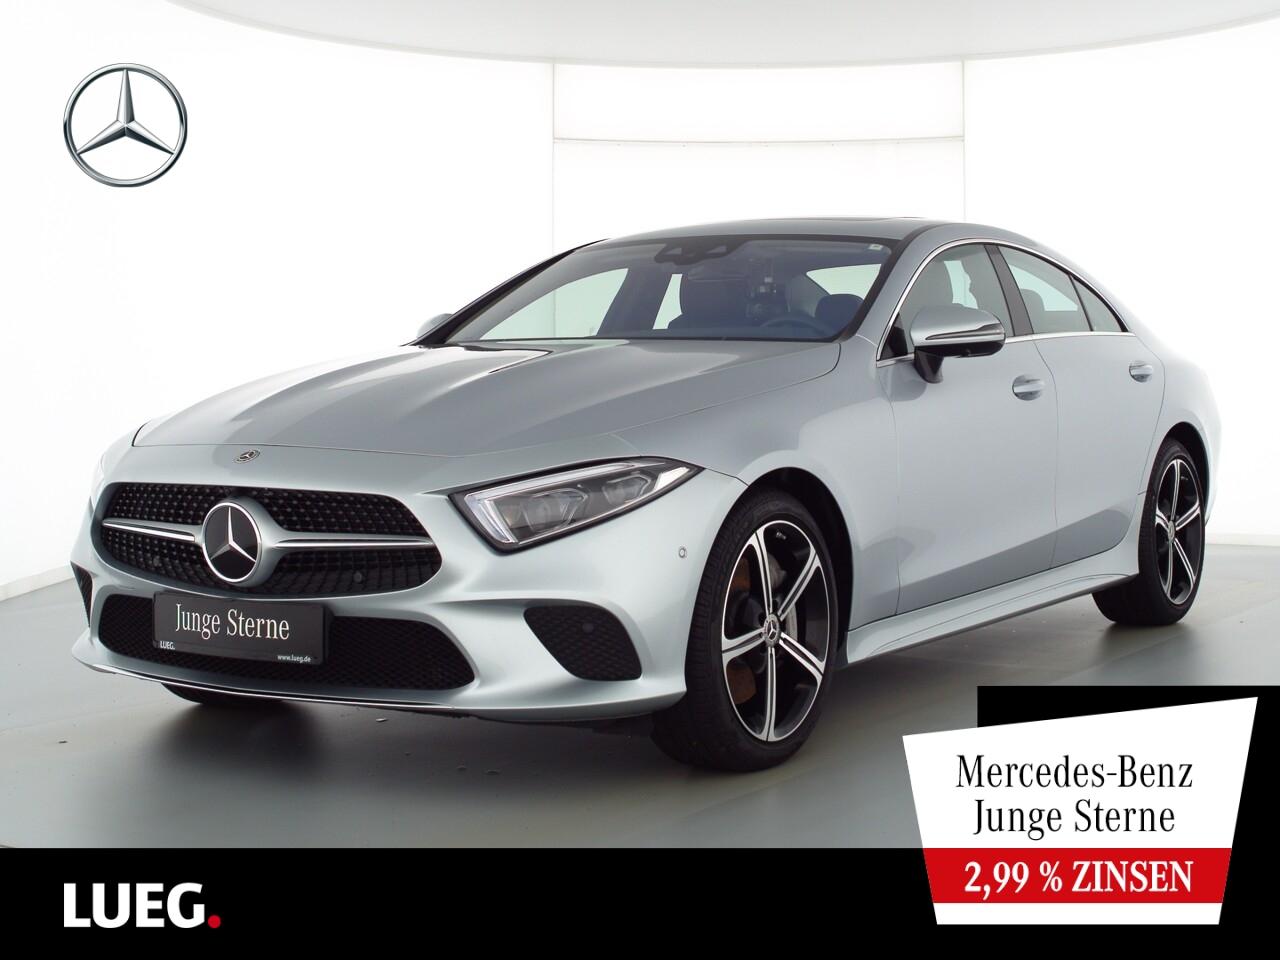 Mercedes-Benz CLS 400 d 4M MBUX+SHD+Mbeam+Widesc+19''+Distr+36, Jahr 2020, Diesel